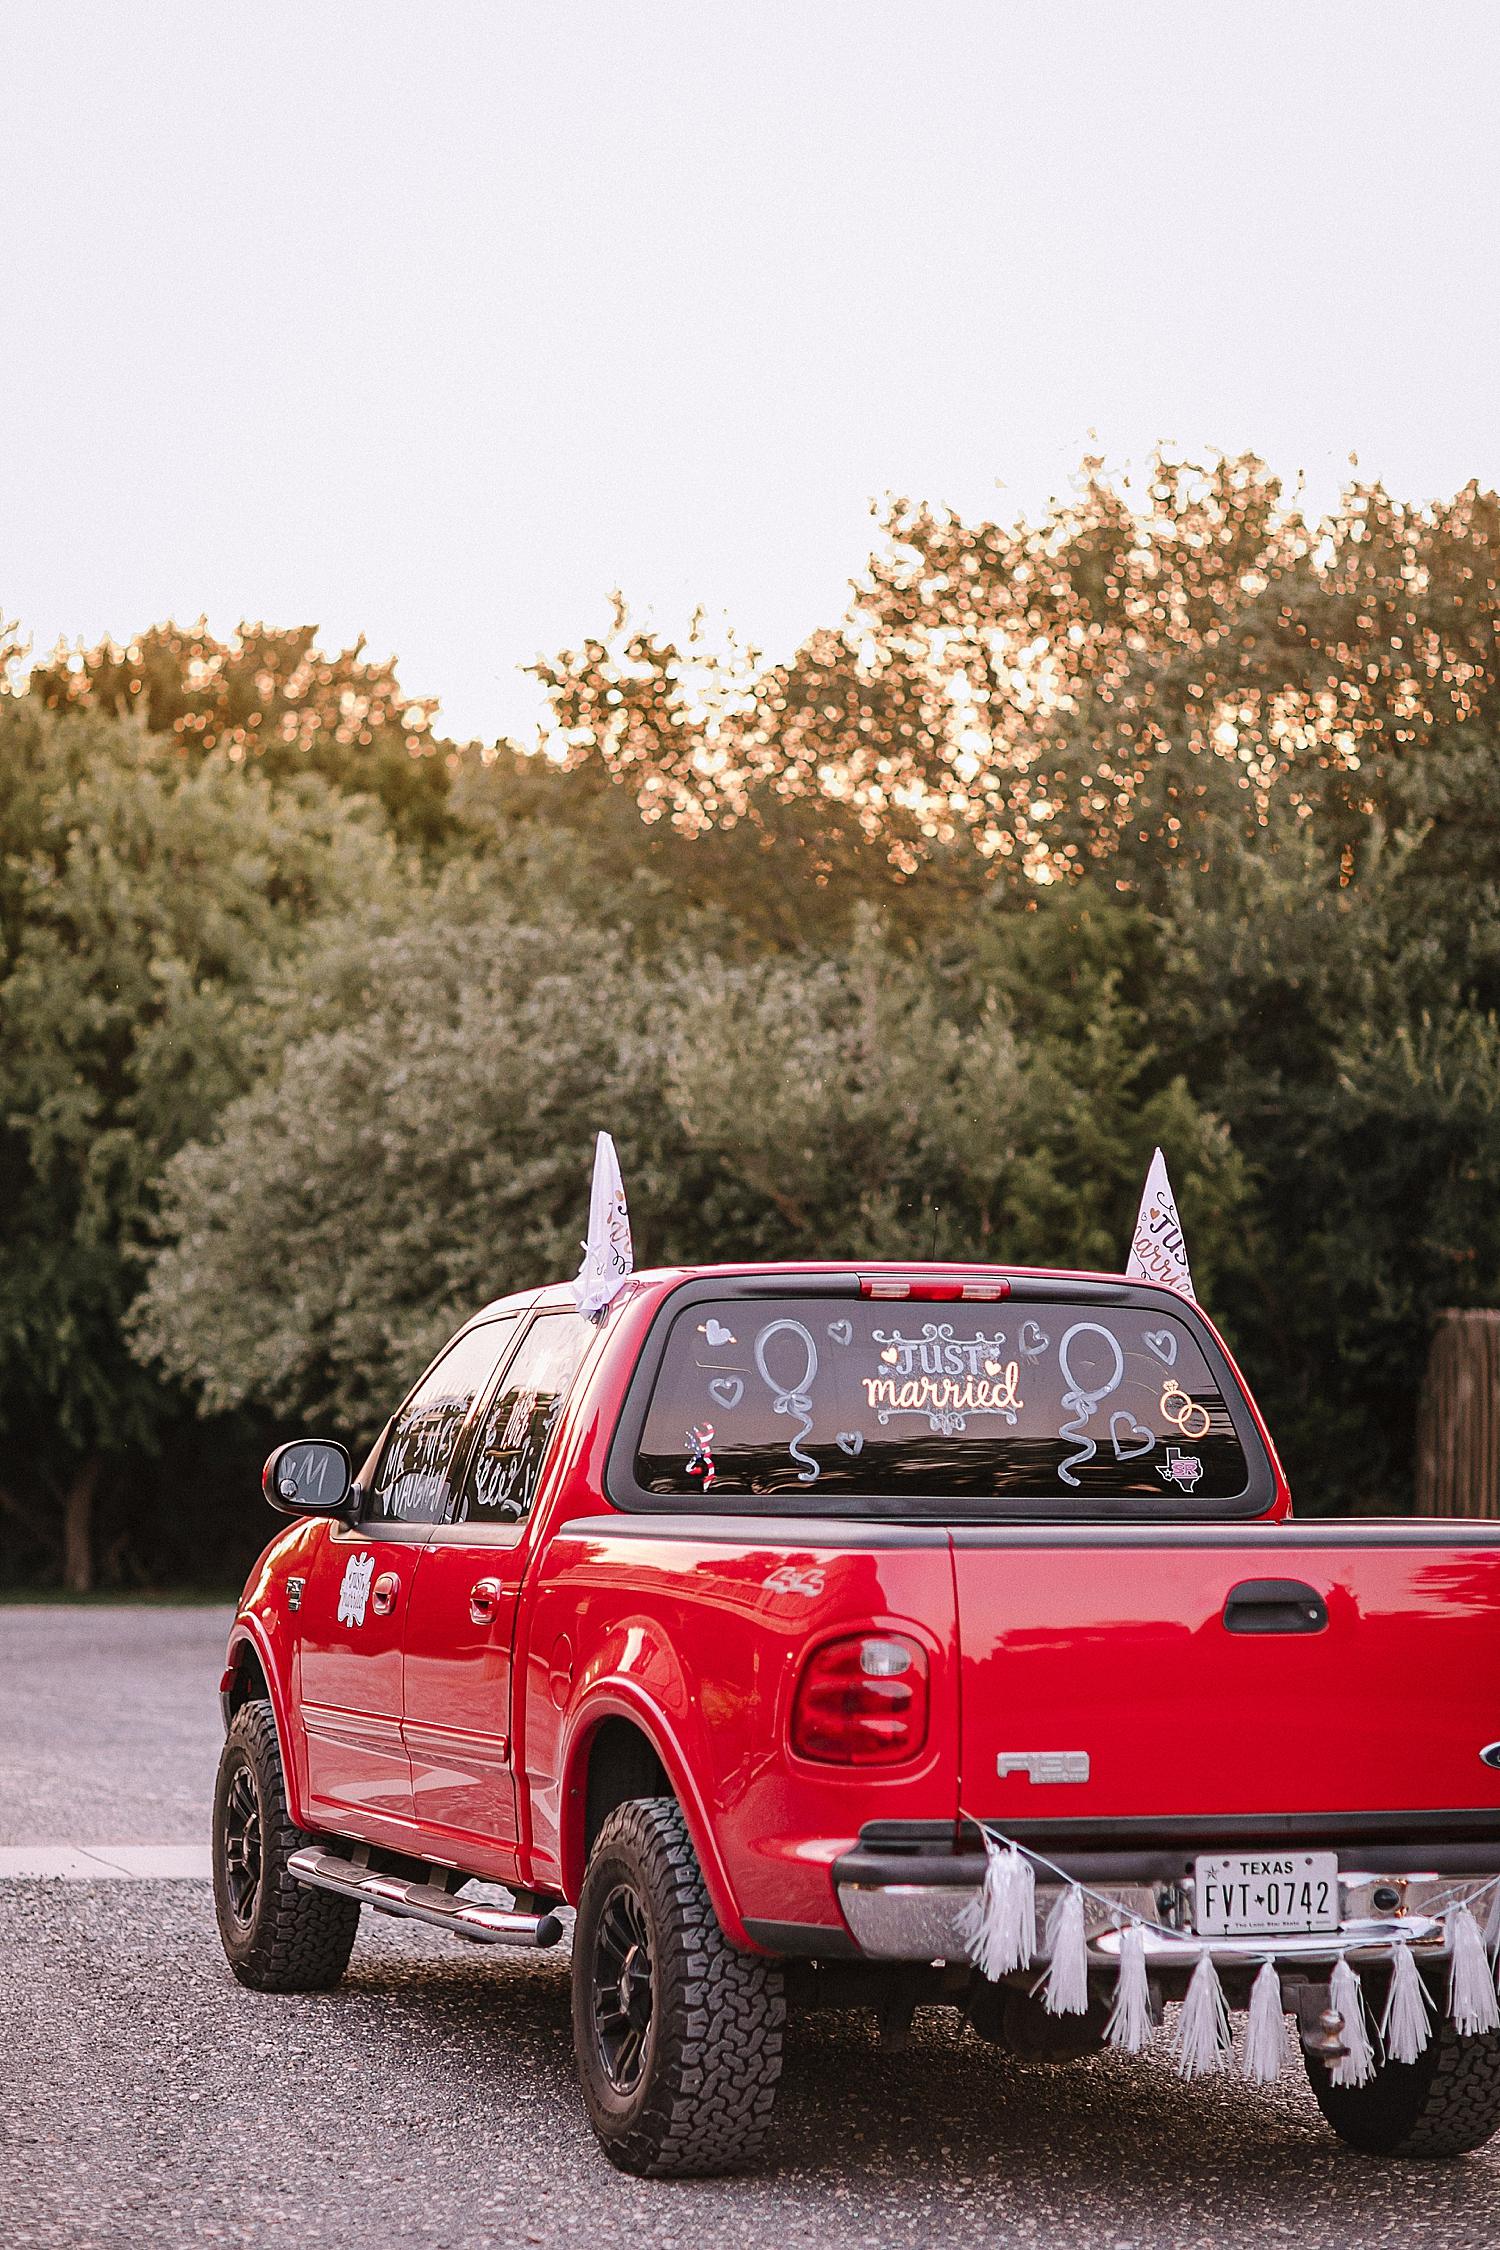 Carly-Barton-Photography-Old-Town-Texas-Rustic-Wedding-Photos-Sunflowers-Boots-Kyle-Texas_0094.jpg